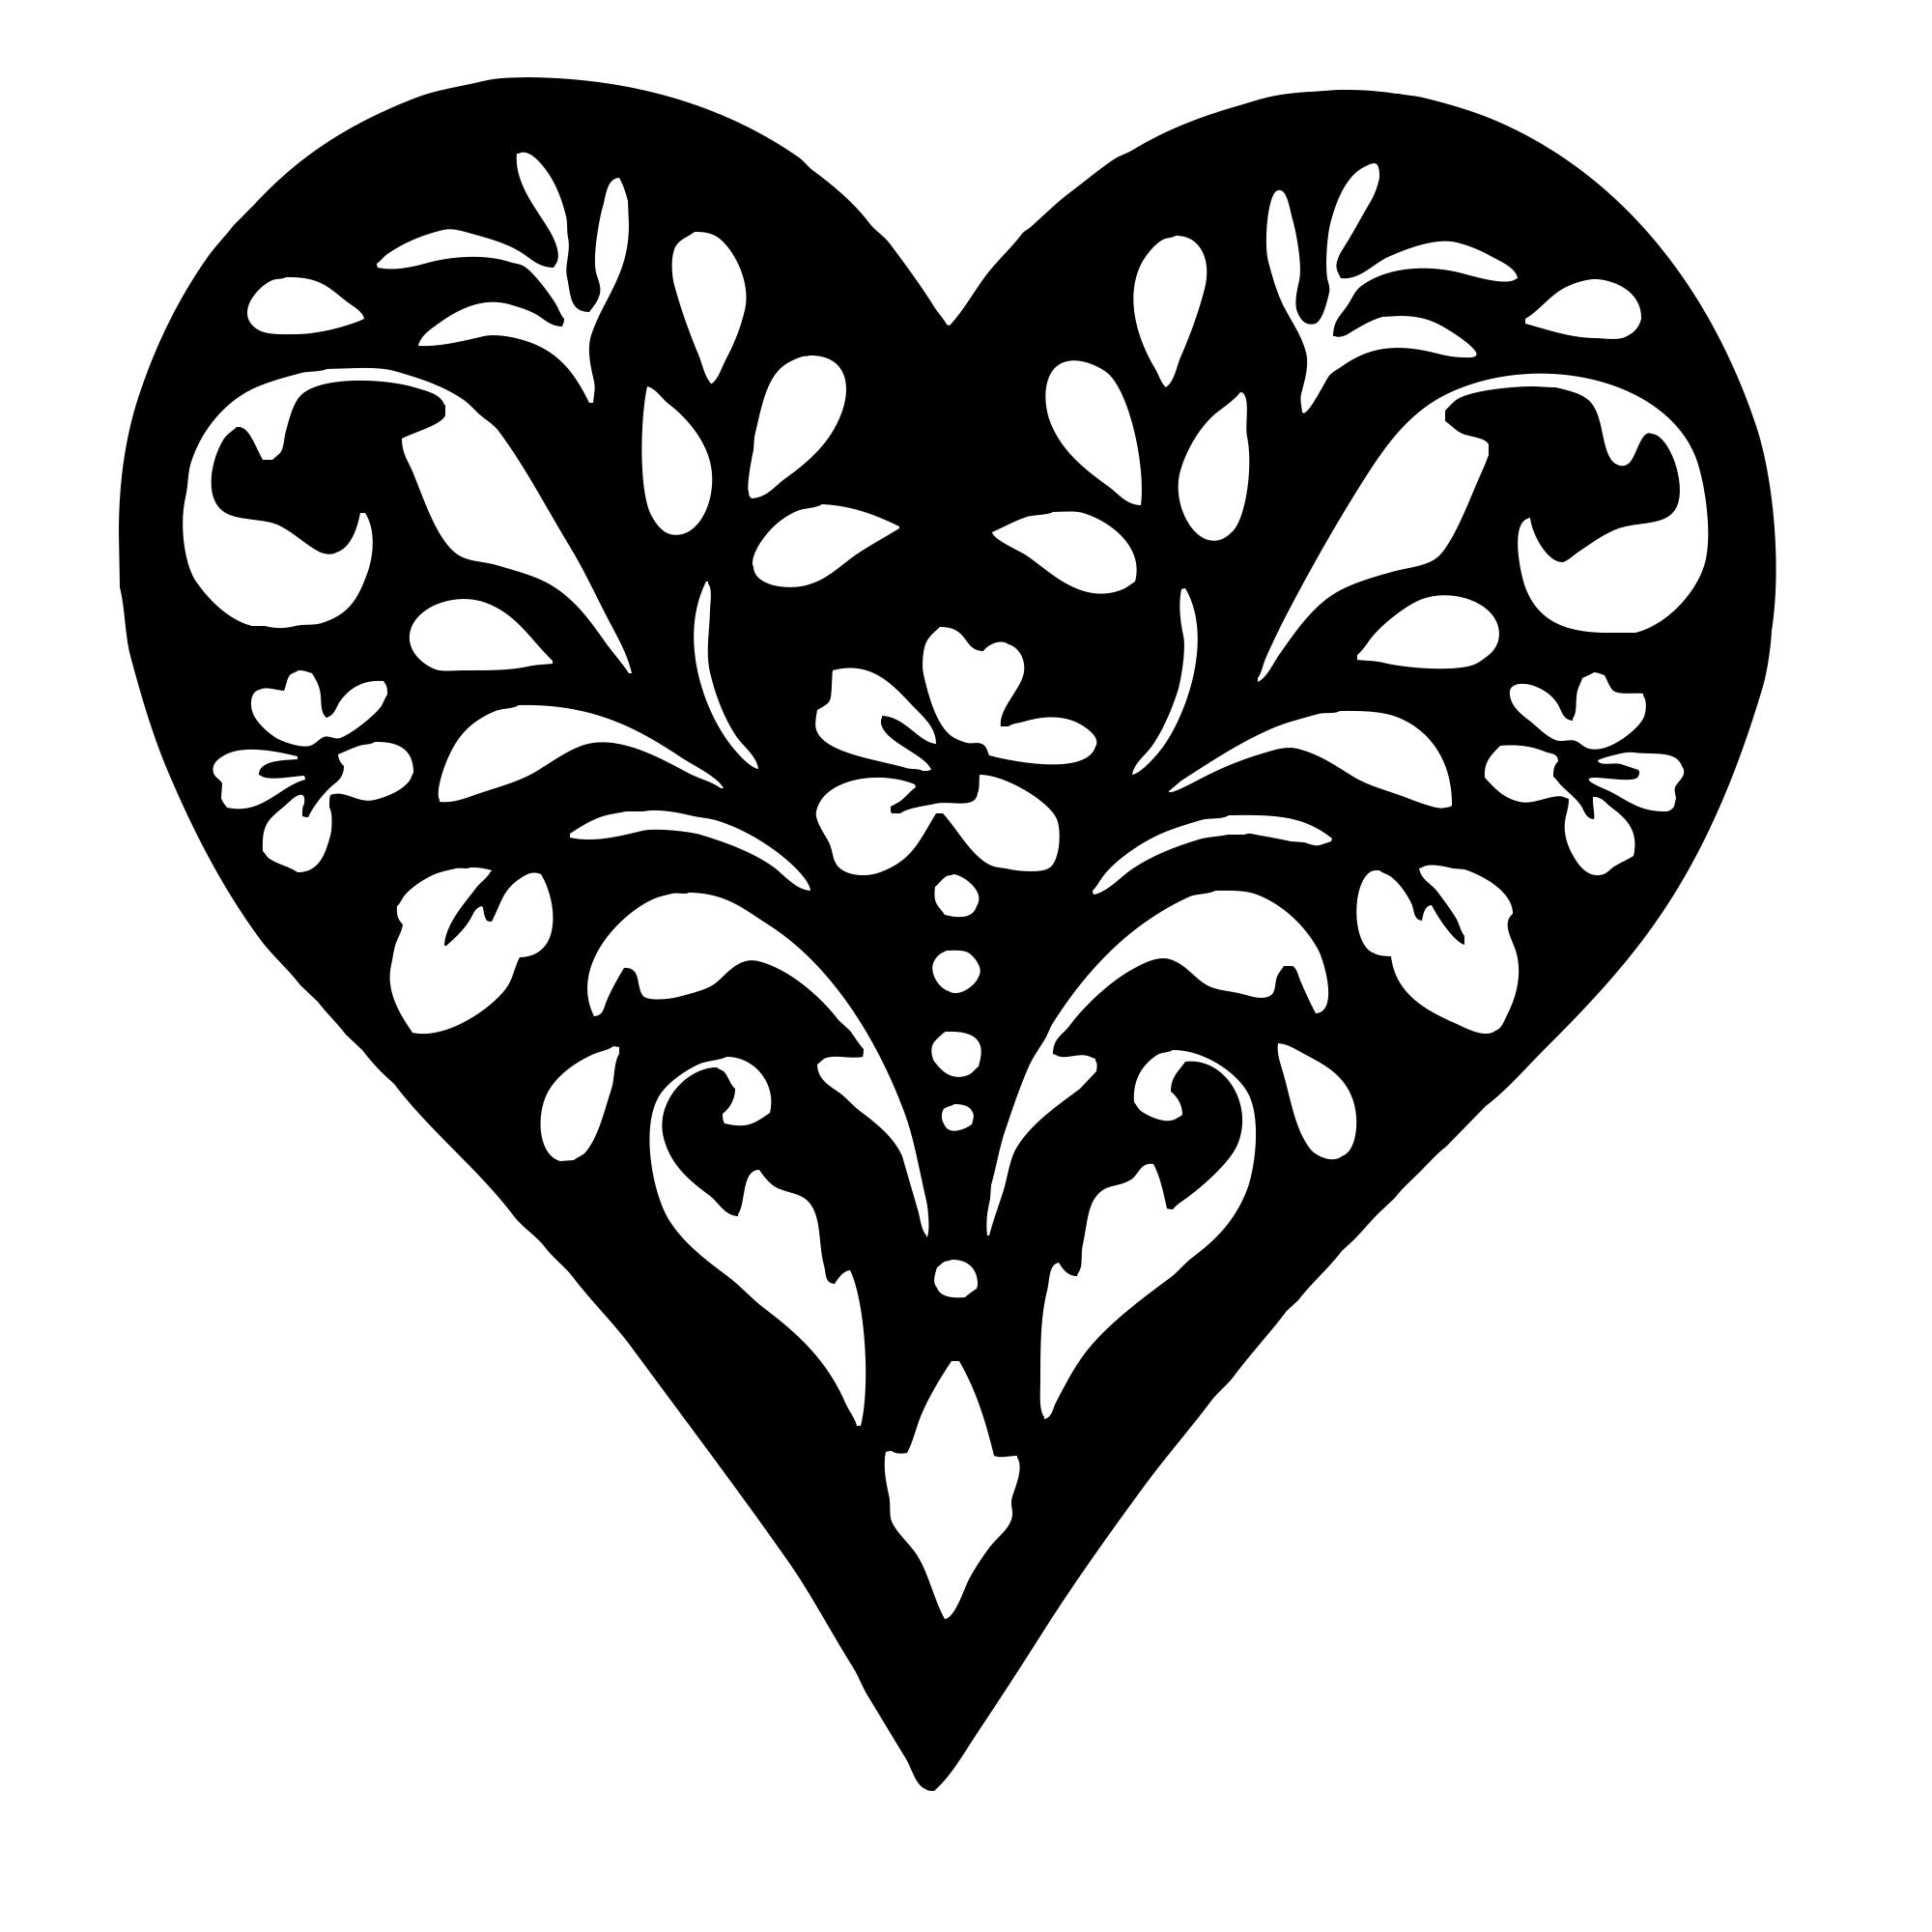 free printable hearts valentine hearts coloring pages free heart printables printable free hearts